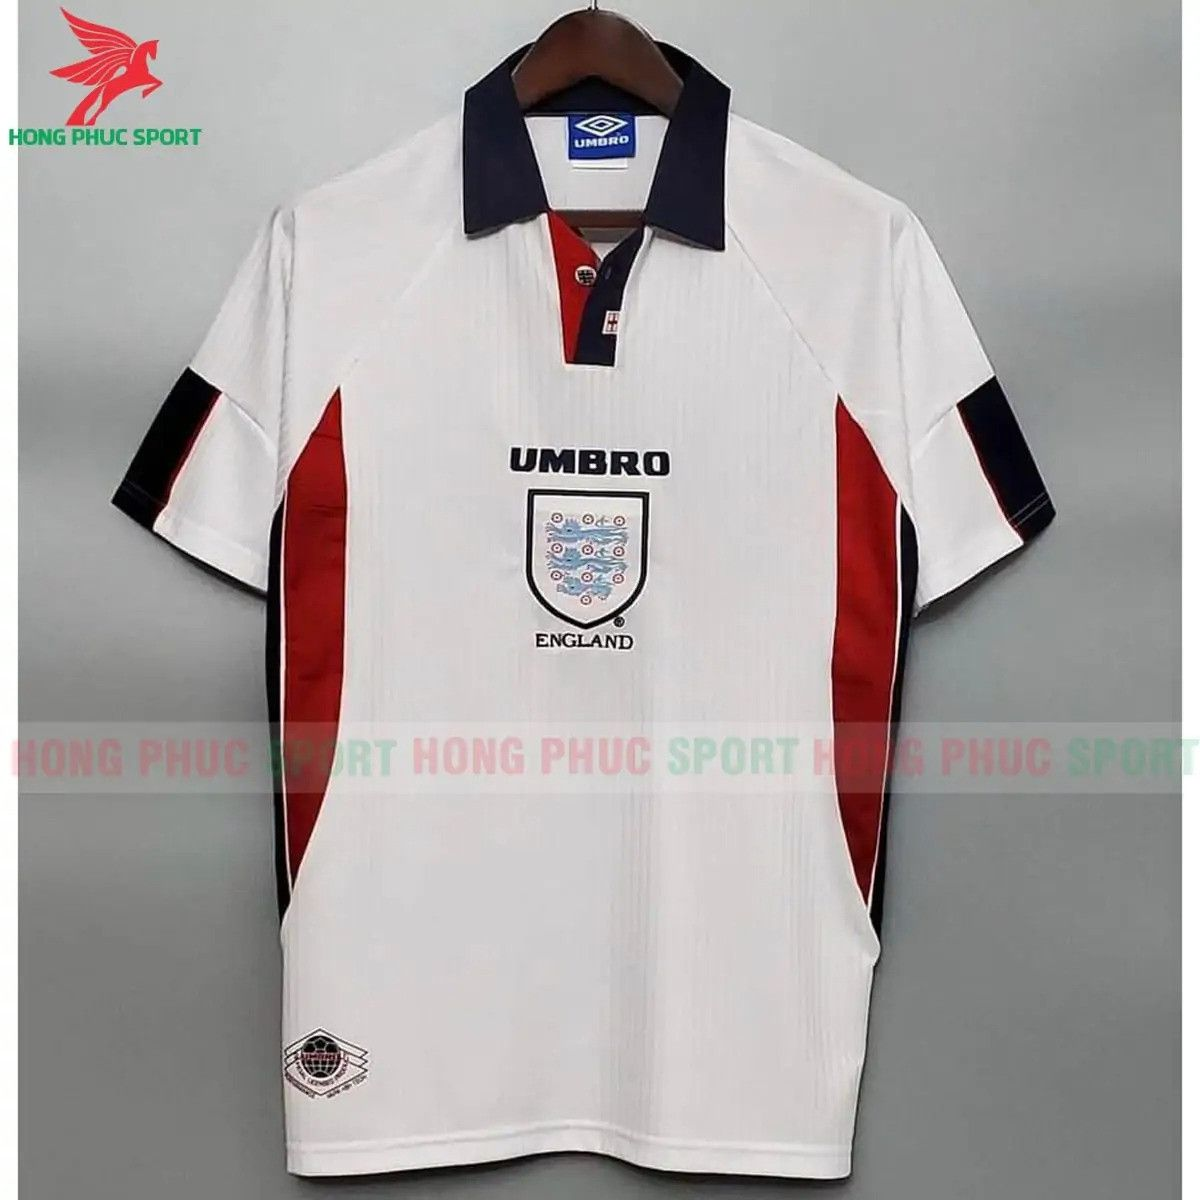 https://cdn.hongphucsport.com/unsafe/s4.shopbay.vn/files/285/ao-dau-tuyen-anh-euro-2004-san-nha-thailand-614adb34bb144.jpg